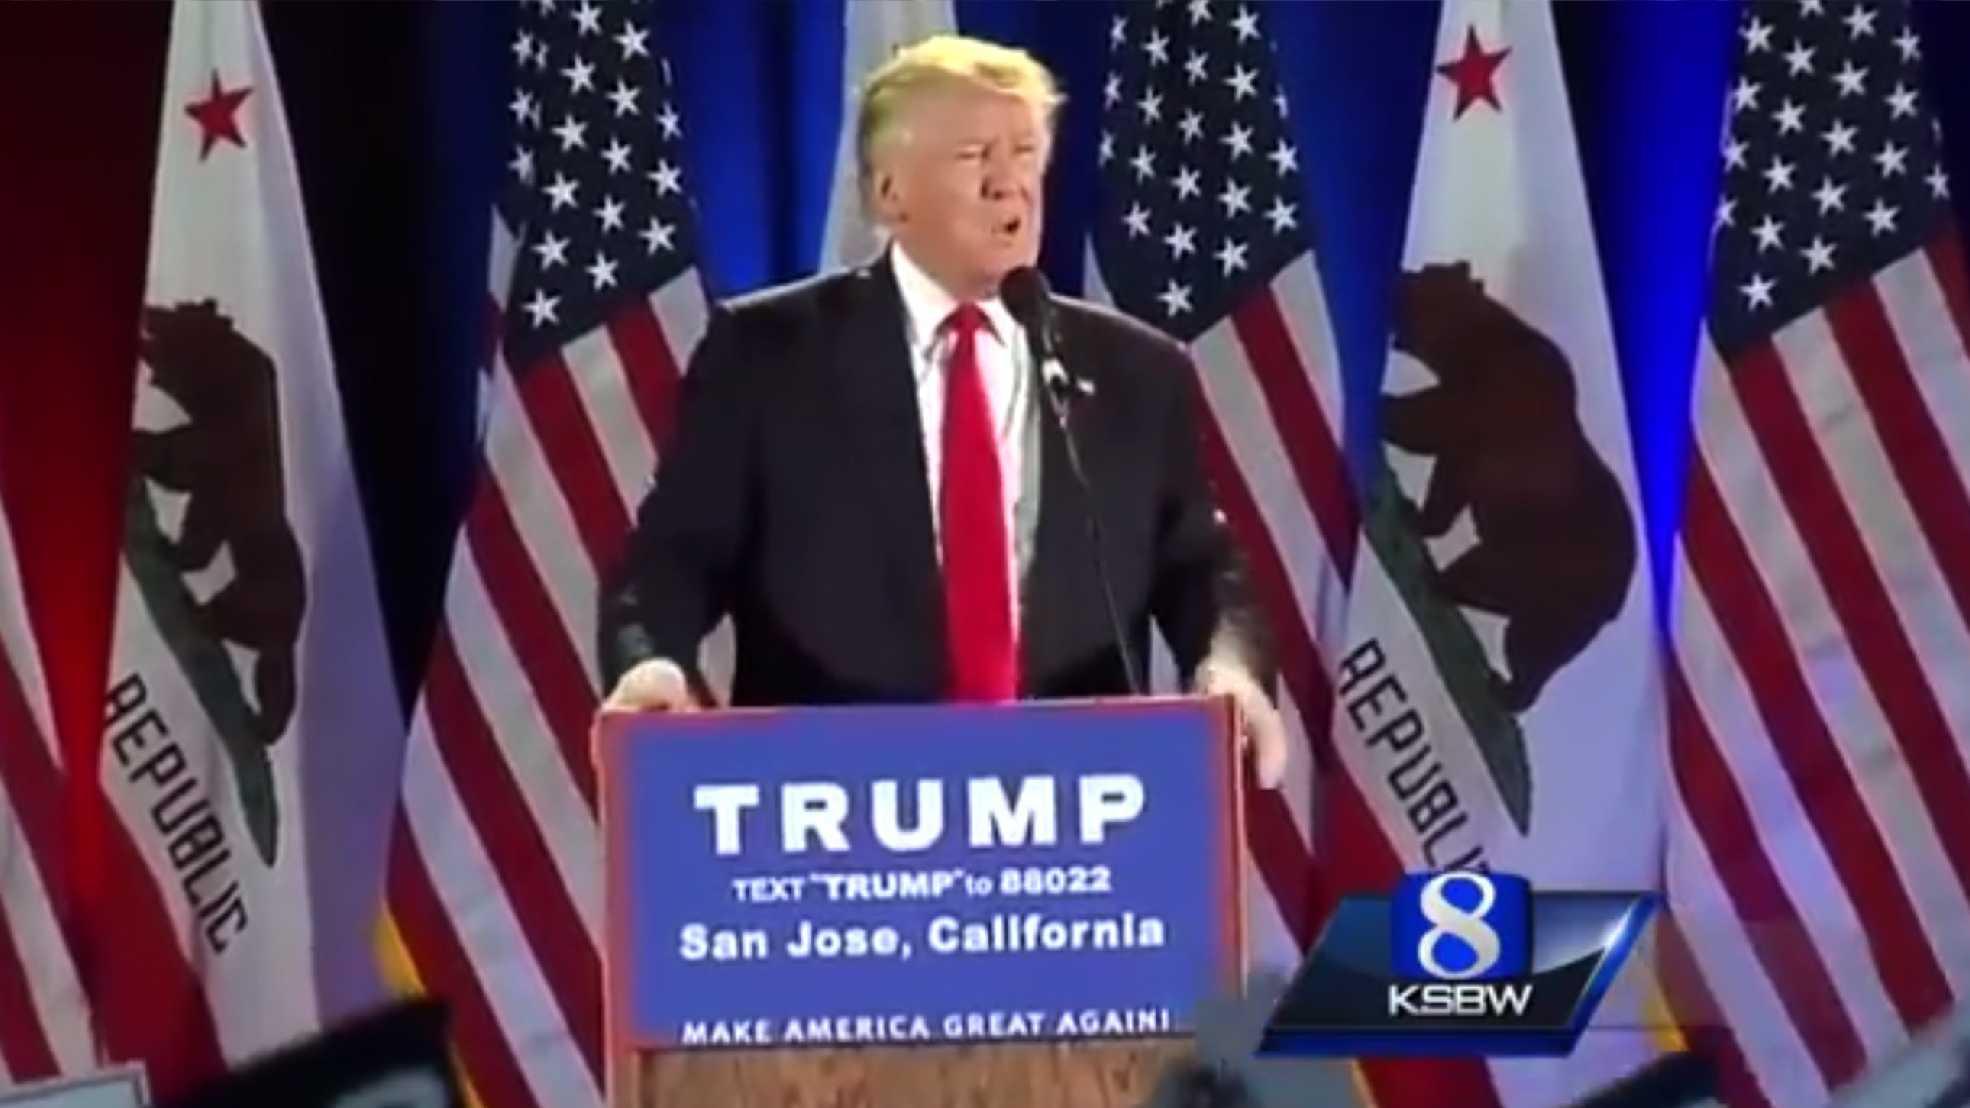 Donald Trump in San Jose